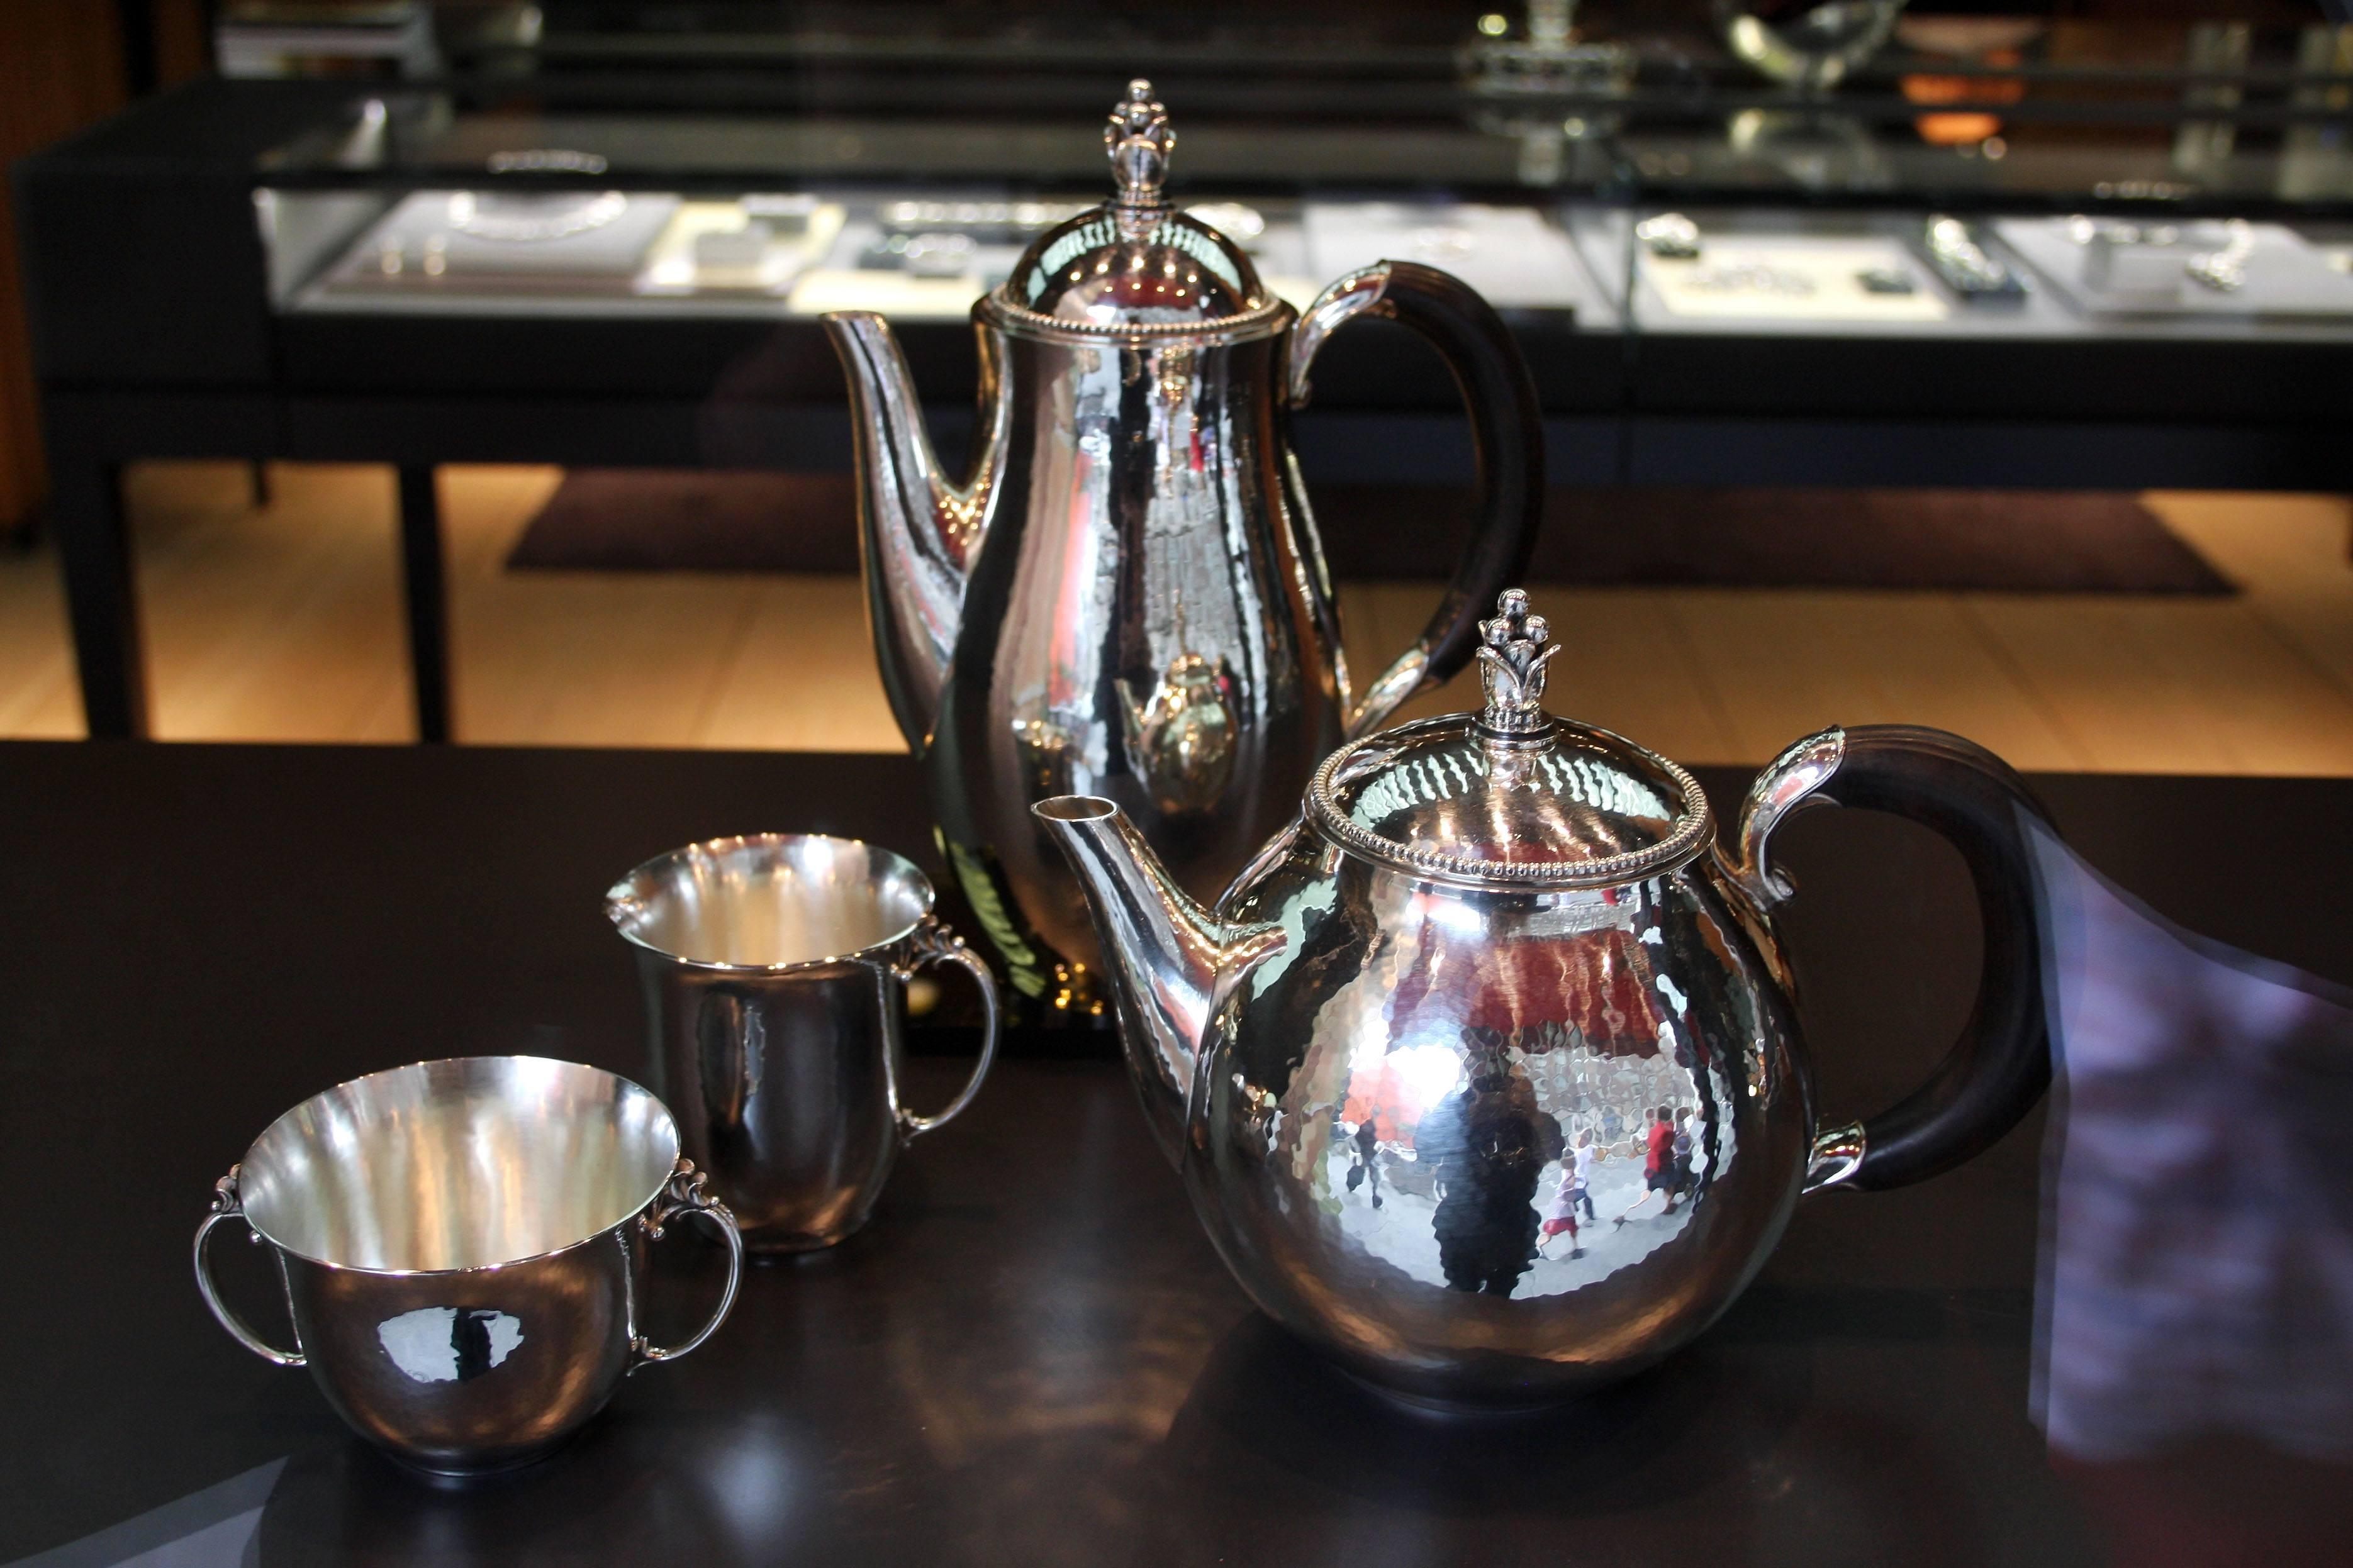 Georg Jensen silver dishes